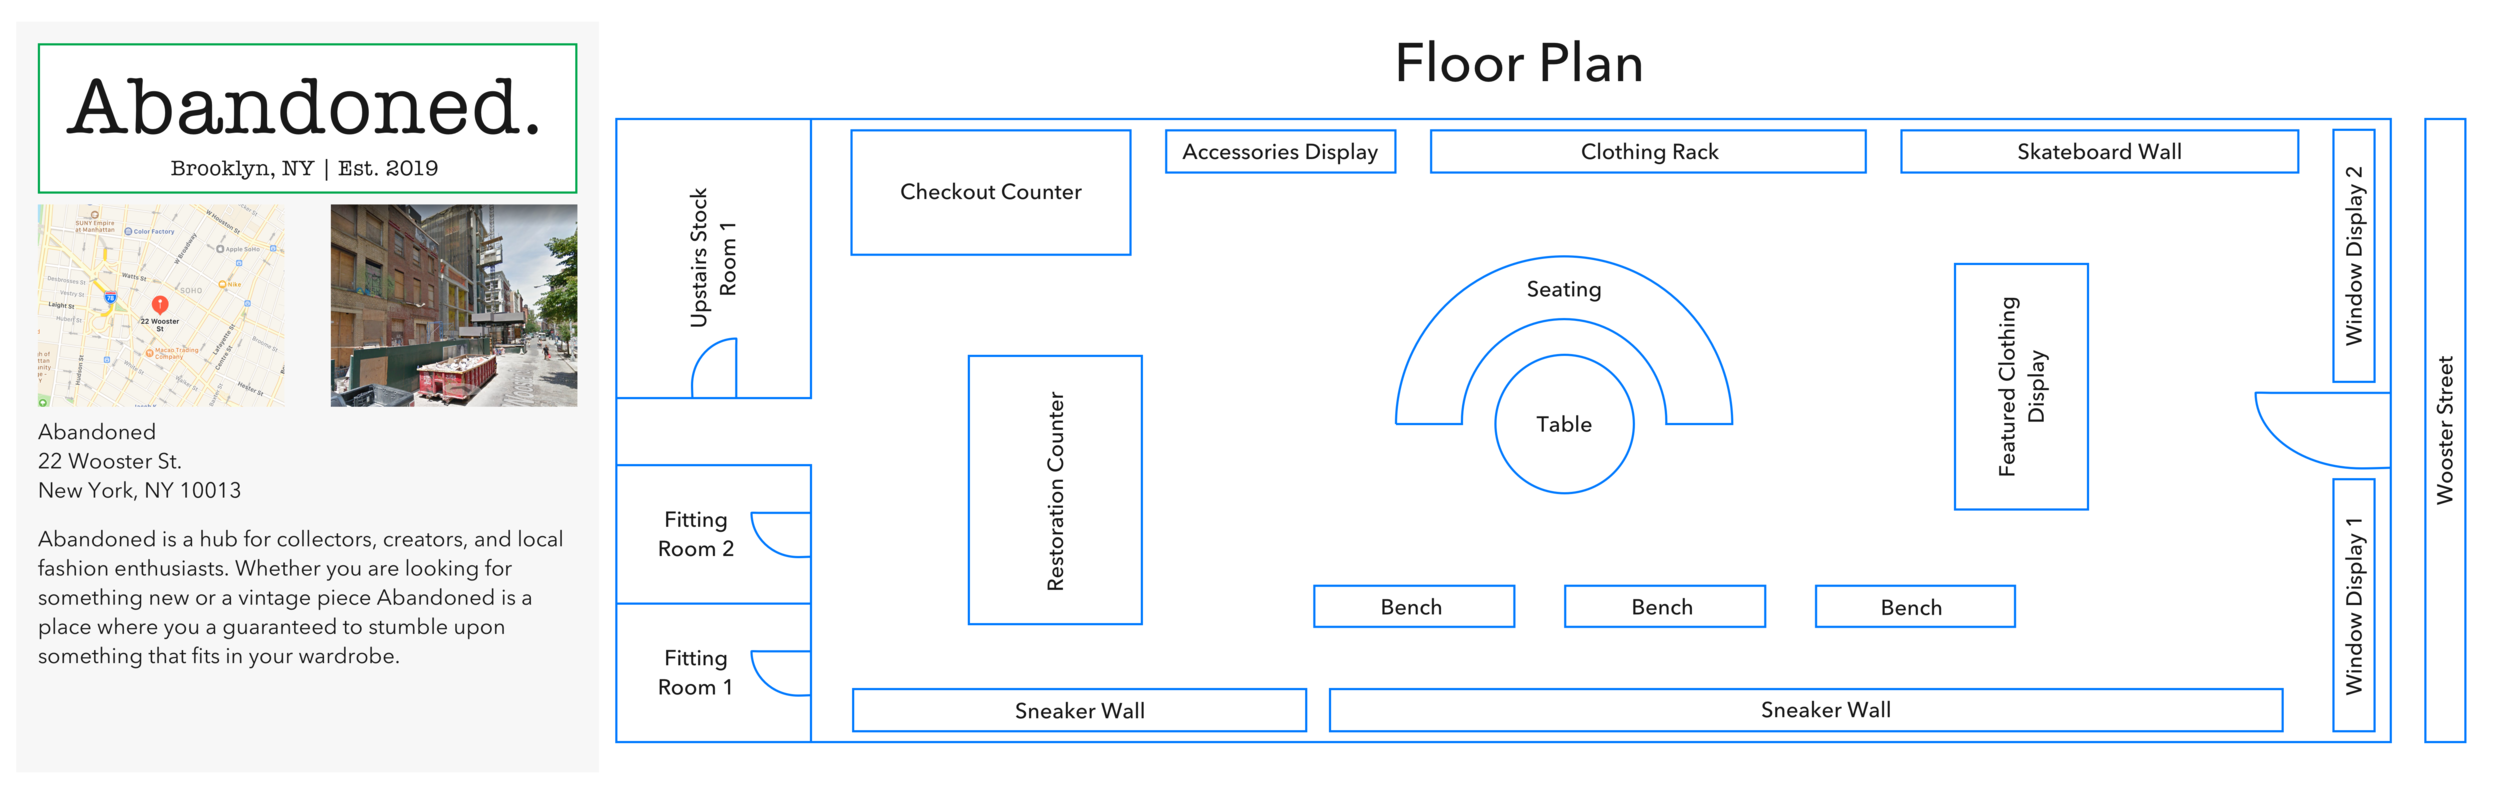 Boutique Floorpan